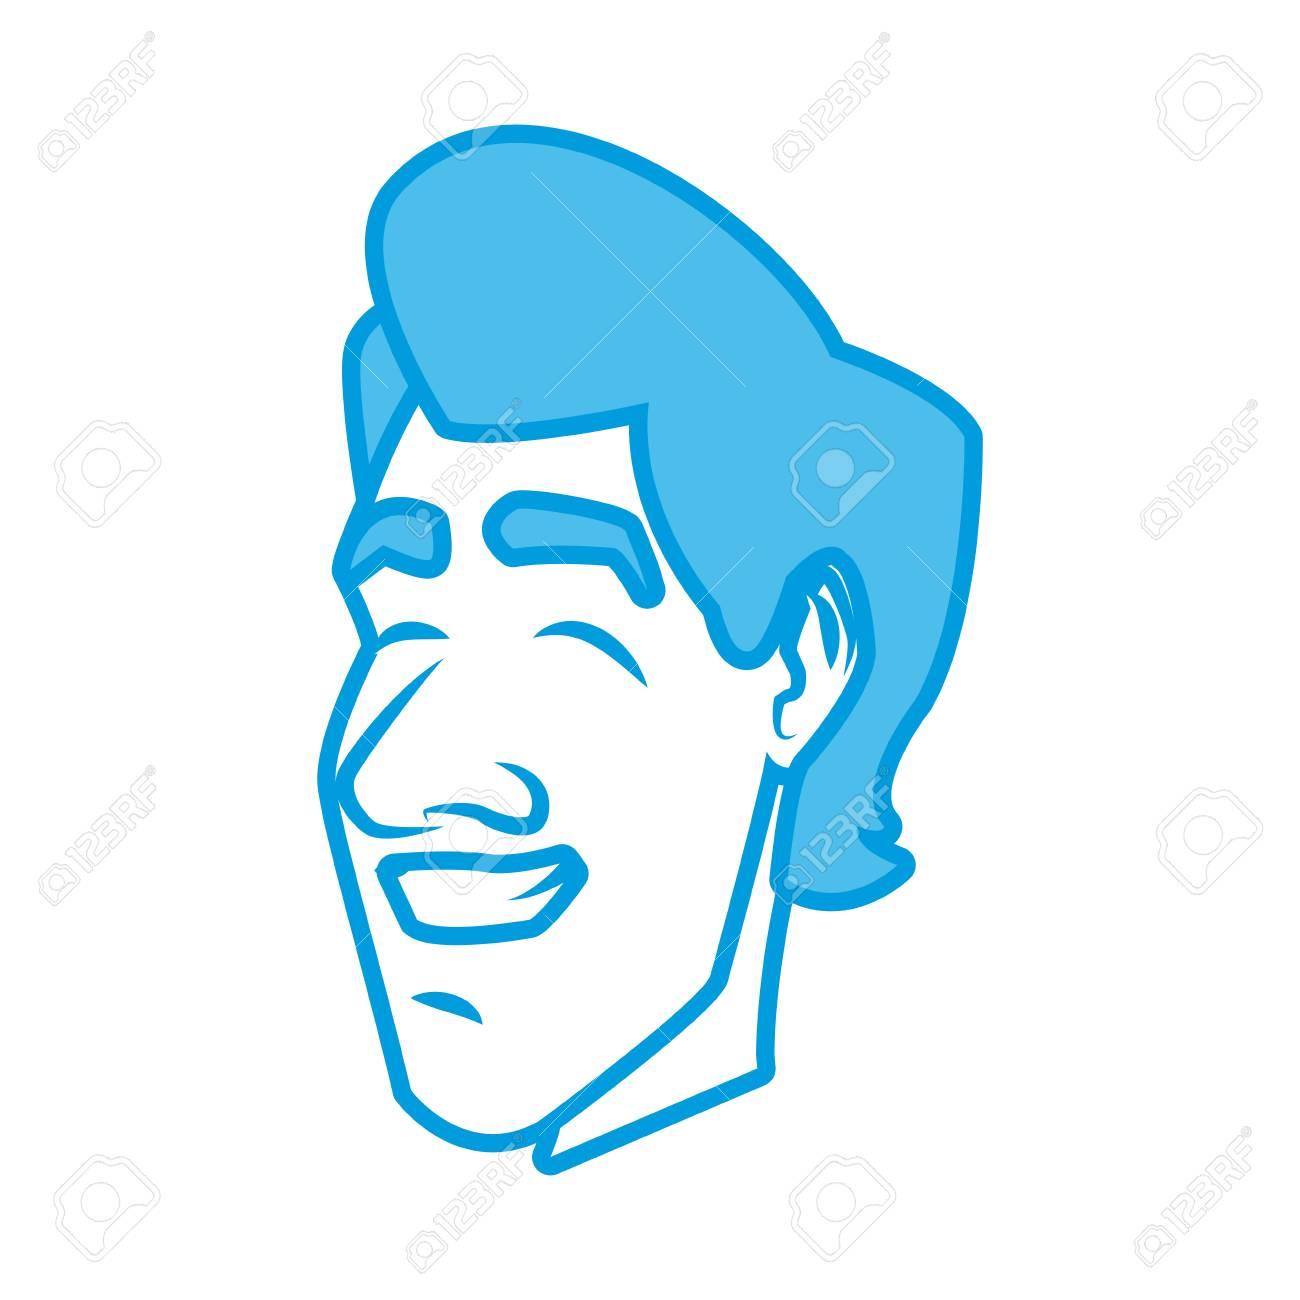 Adult man face cartoon icon vector illustration graphic design.